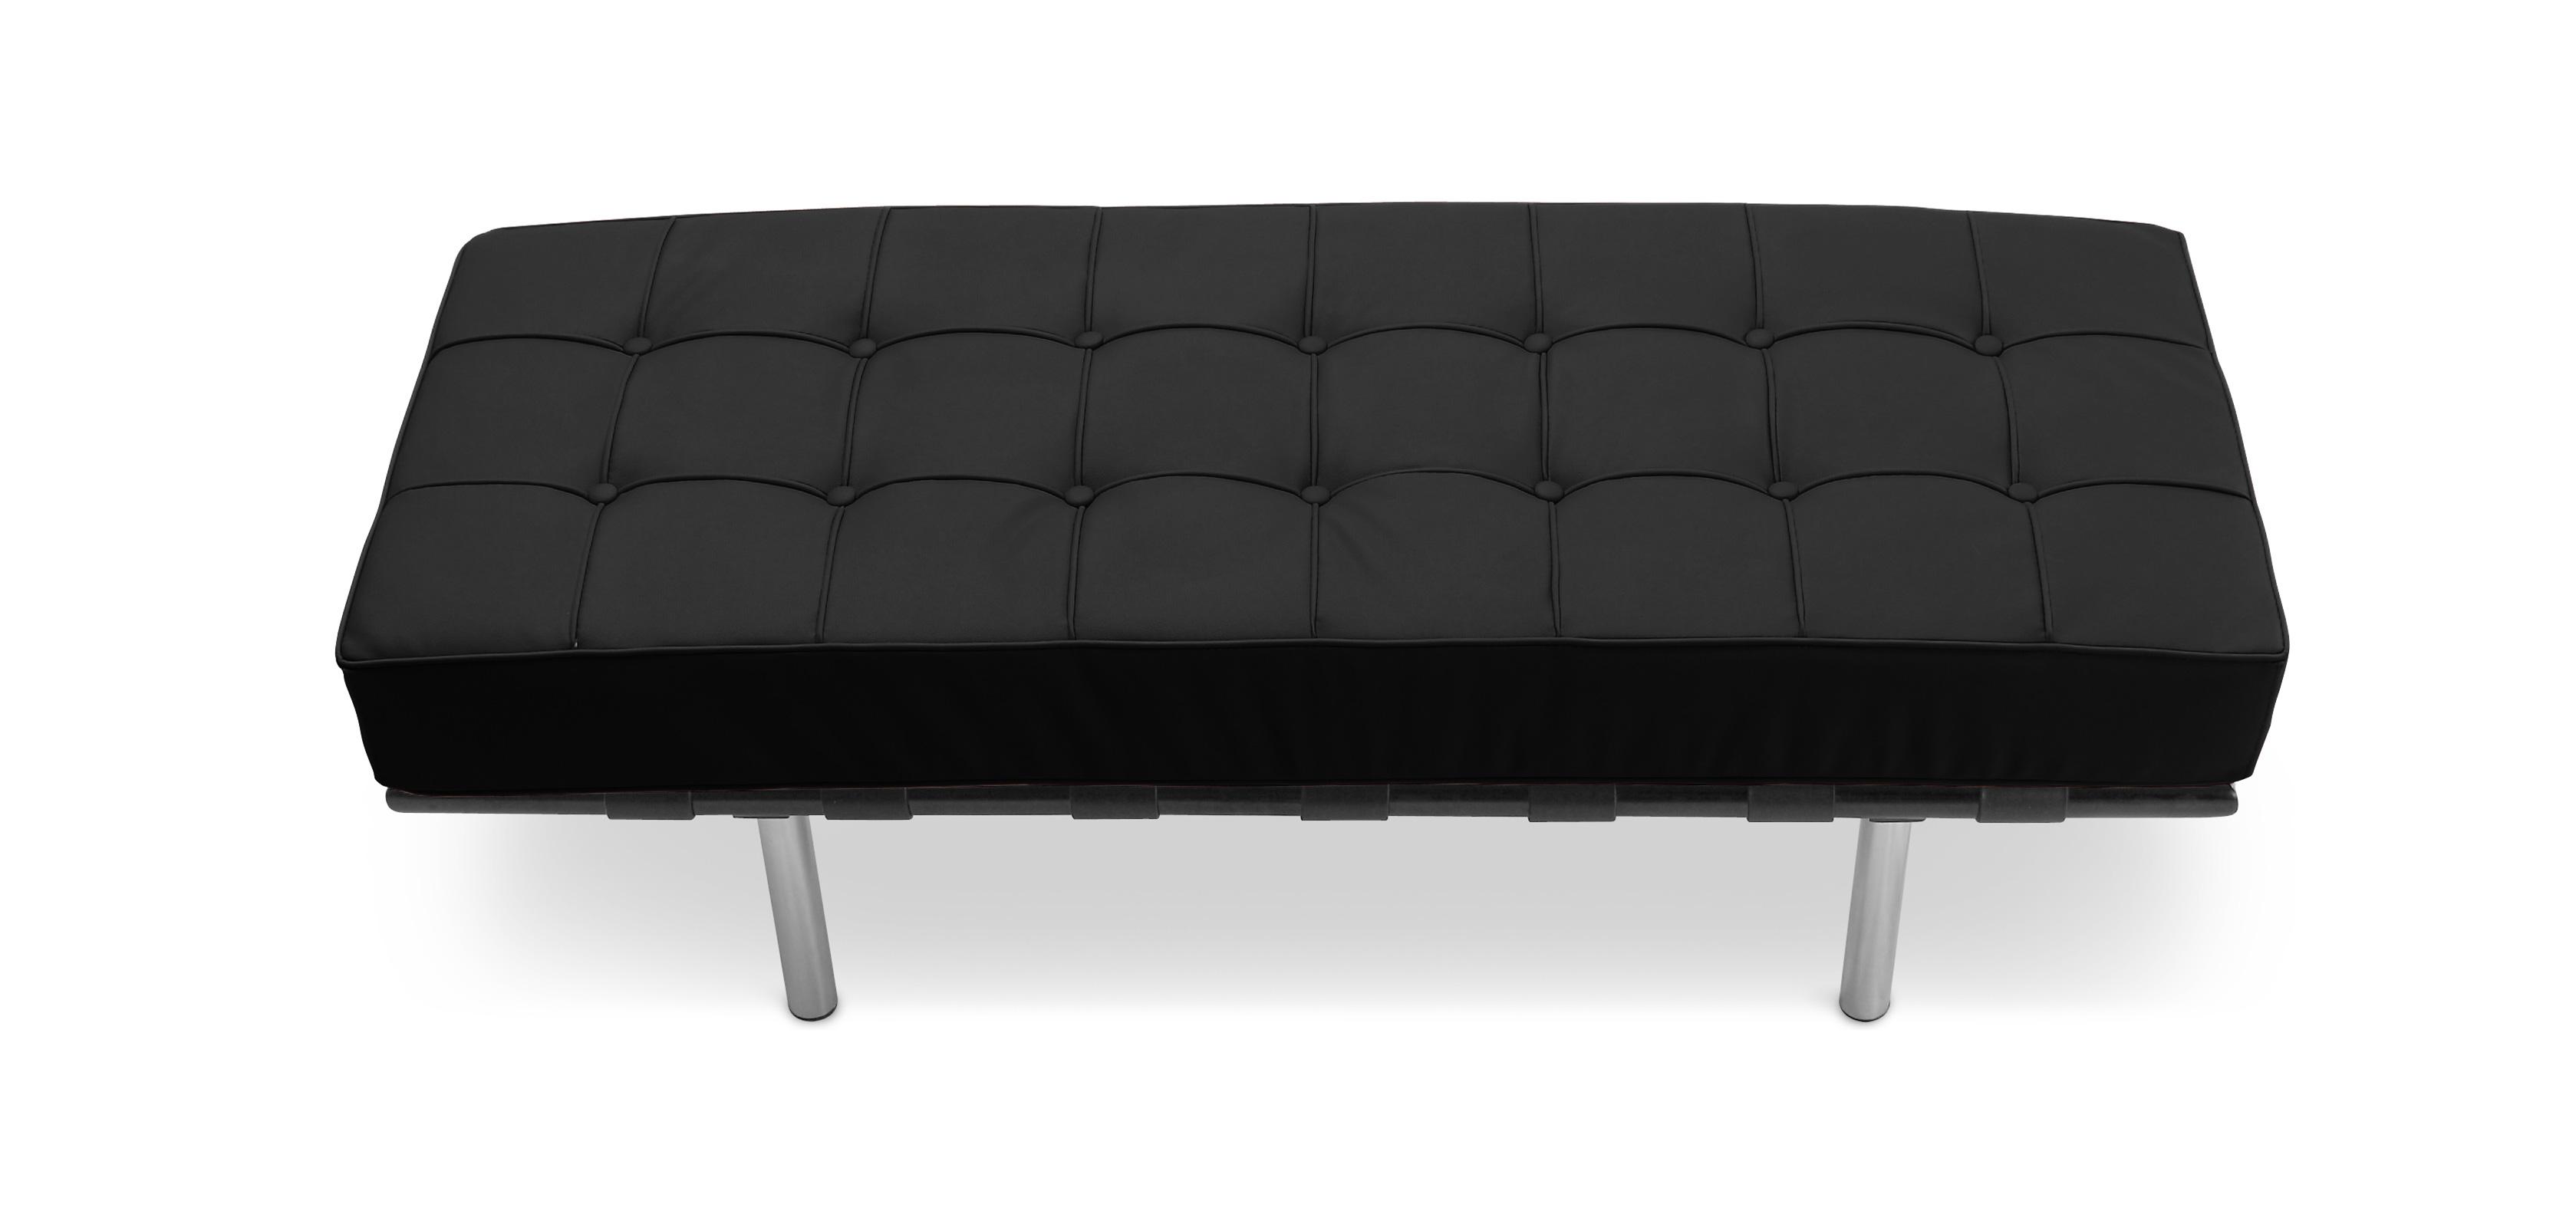 banc barcelona ludwig mies van der rohe. Black Bedroom Furniture Sets. Home Design Ideas